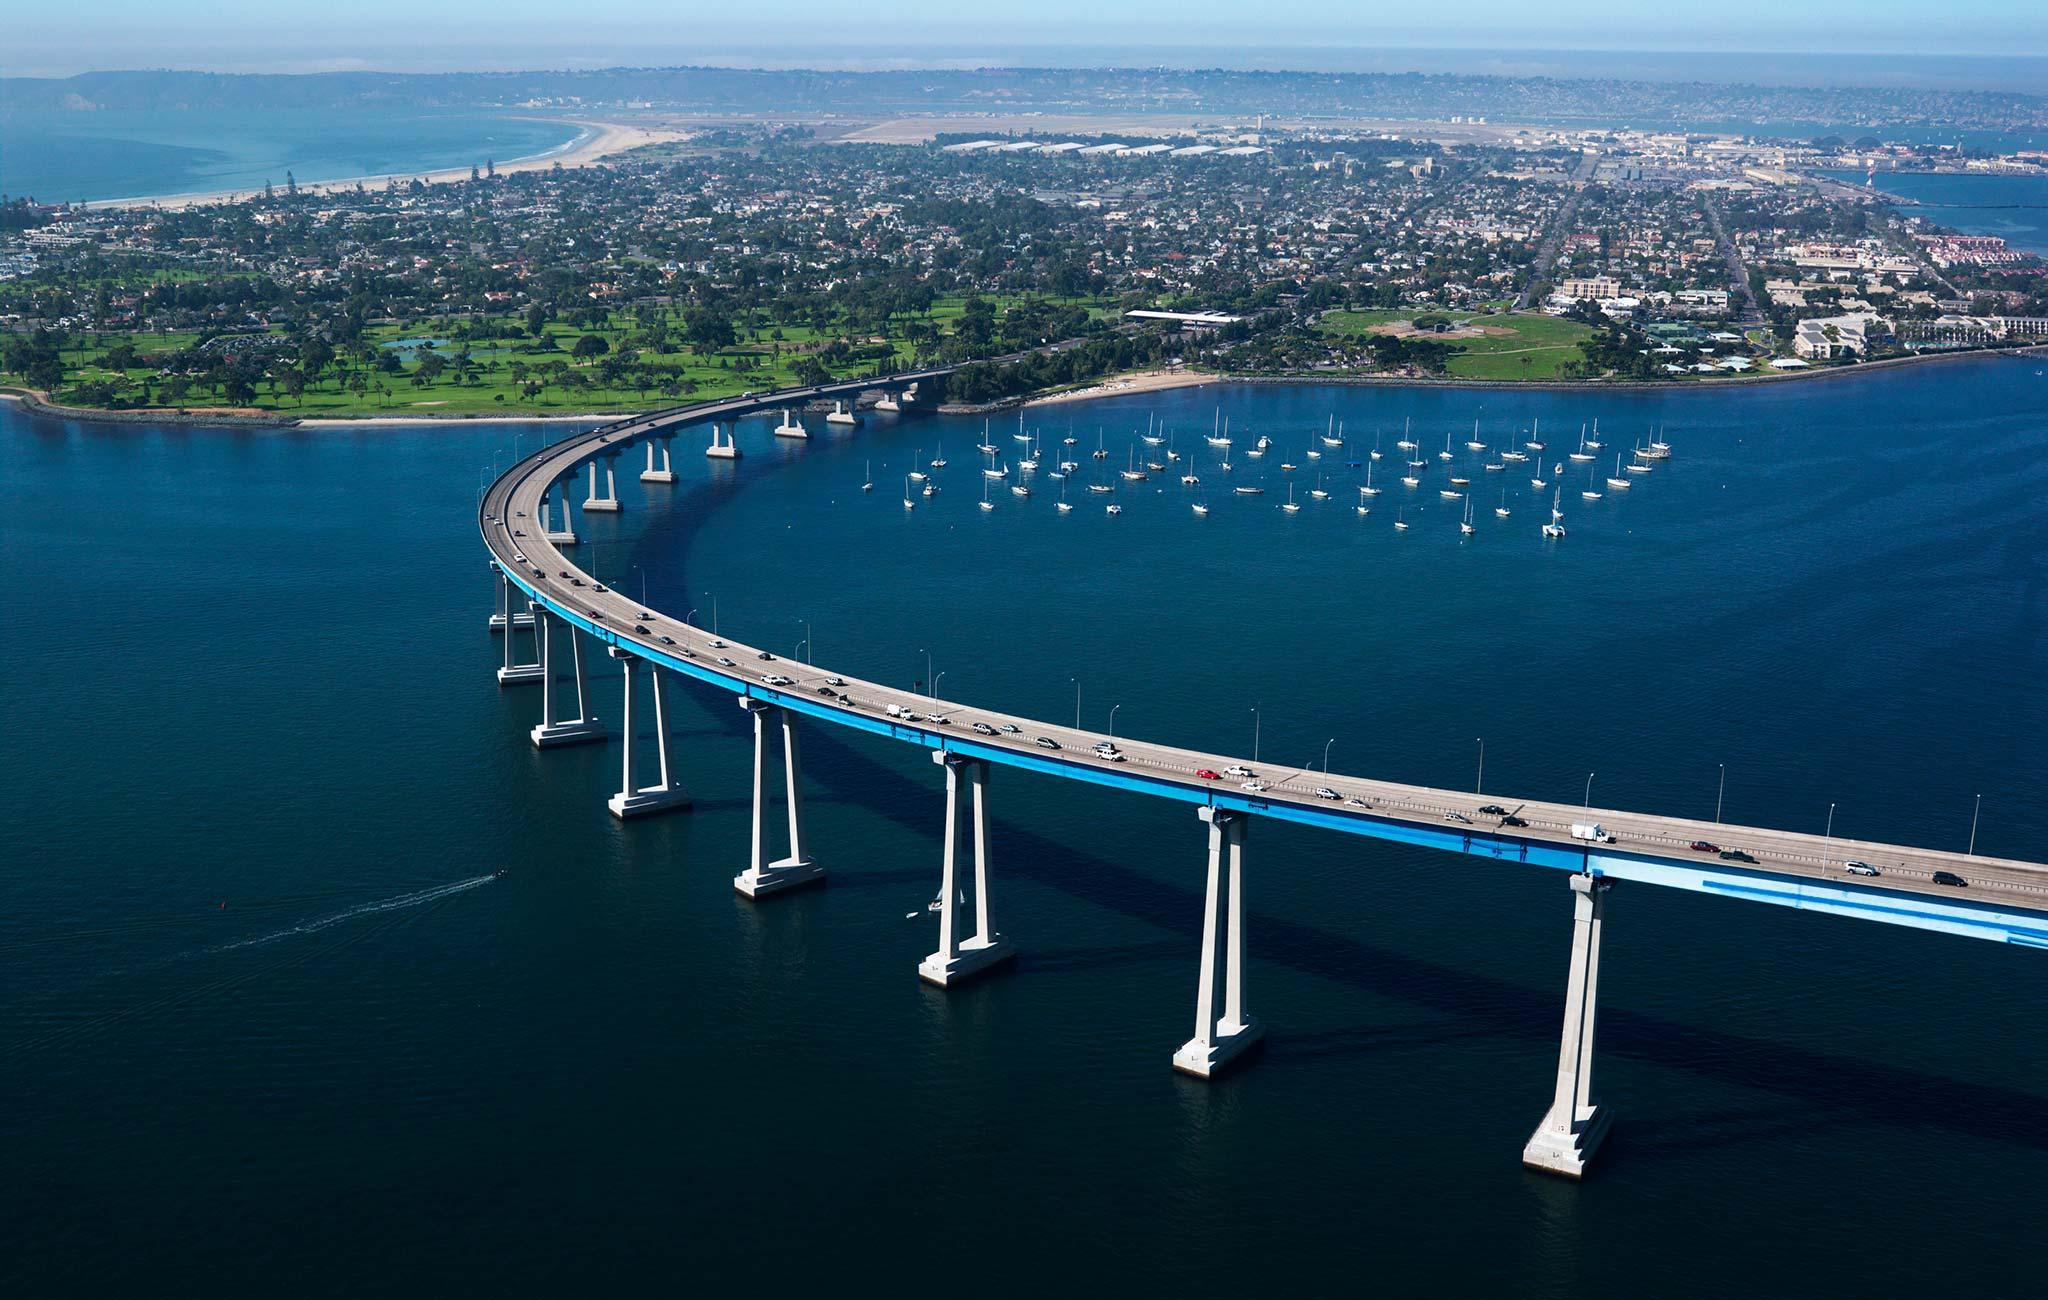 coronado-island - Sunny San Diego